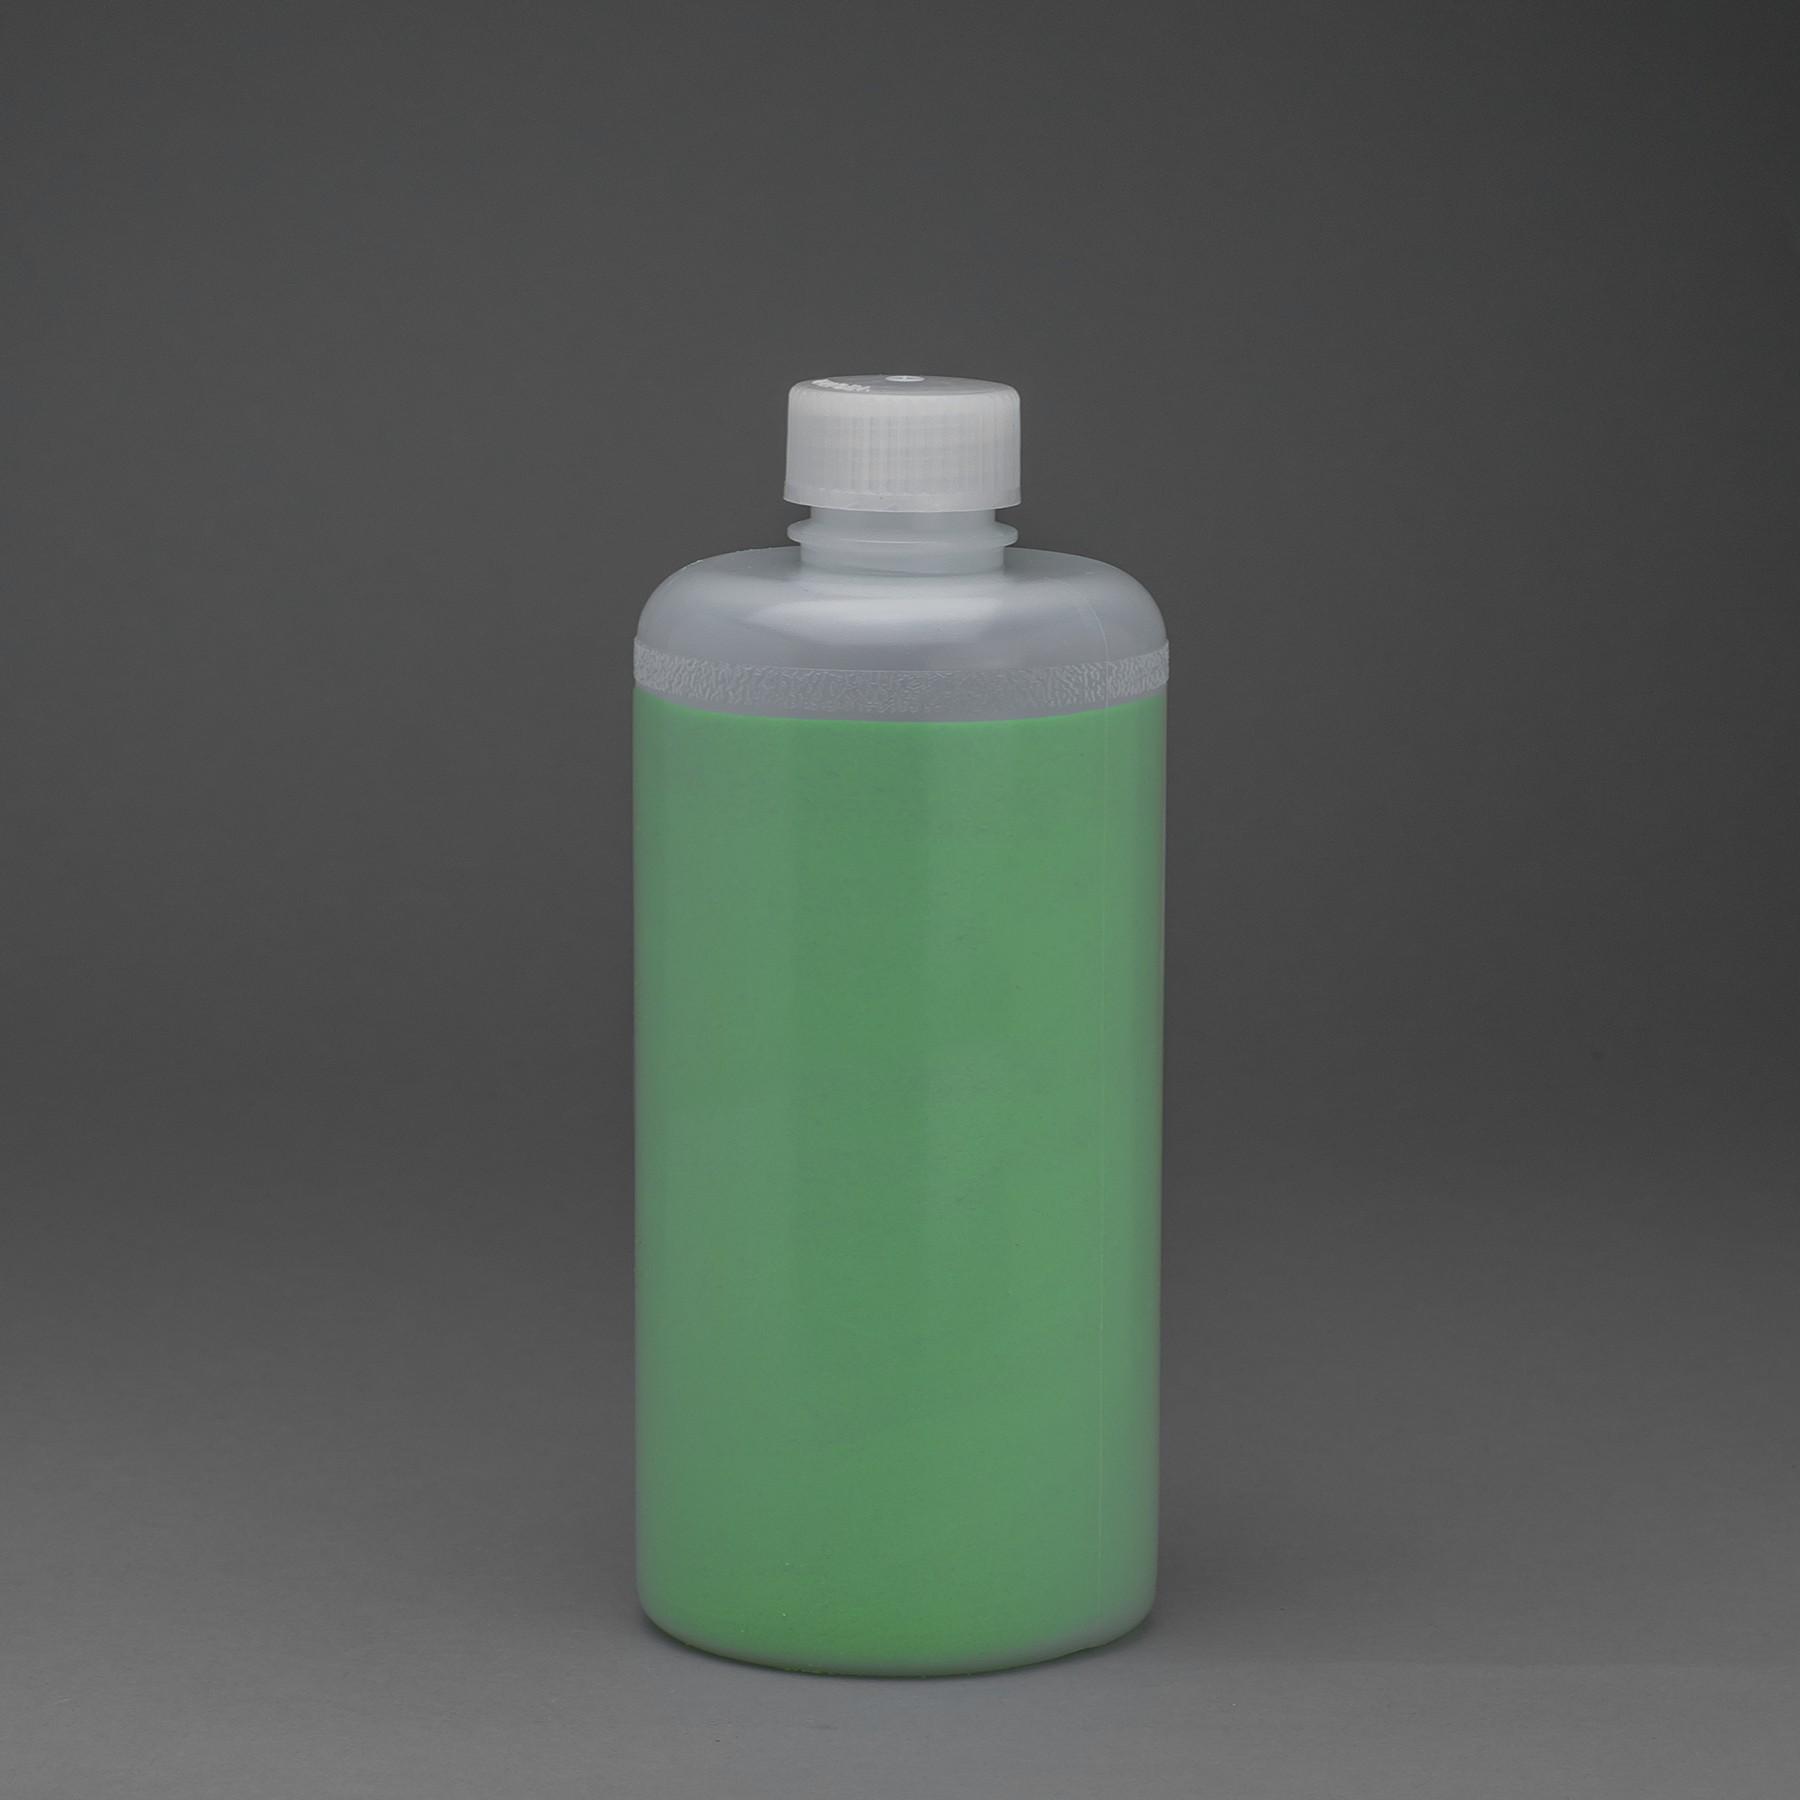 SP Bel-Art Precisionware Narrow-Mouth Low-Density Polyethylene Bottles; 500ml (16oz), Polypropylene Cap, 28mm Closure (Pack of 12)